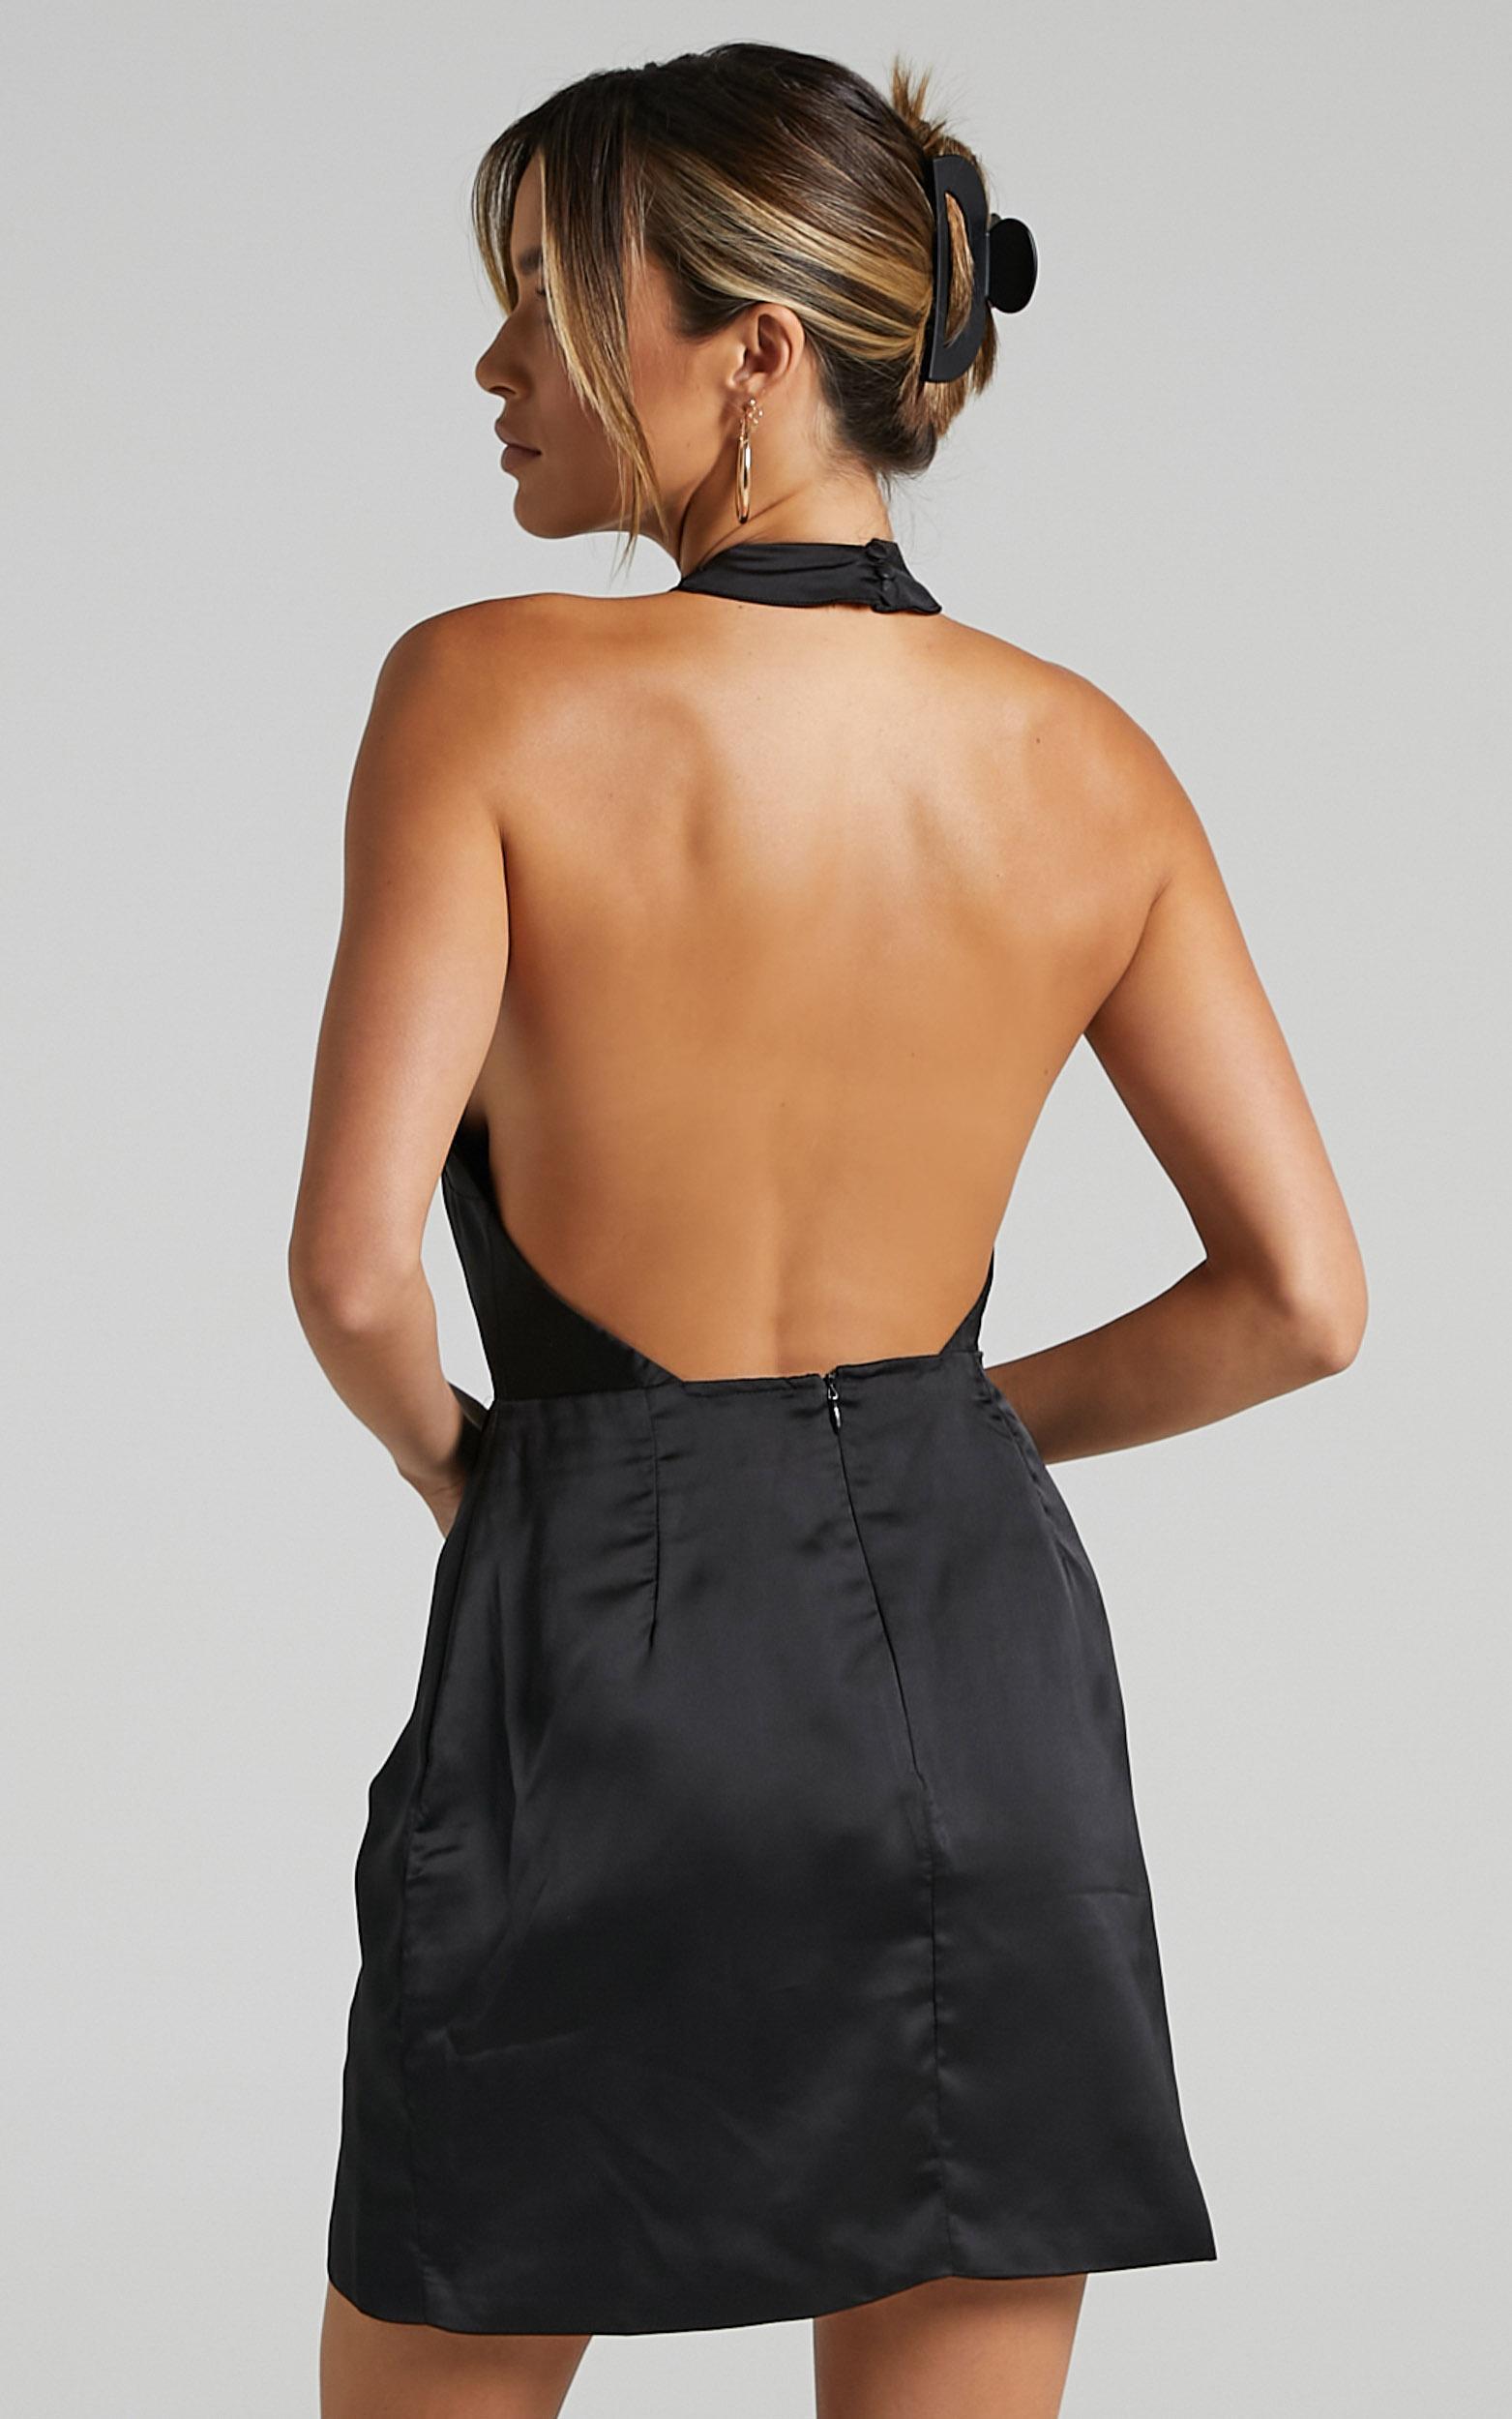 Cardea Dress in Black Satin - 6 (XS), Black, hi-res image number null